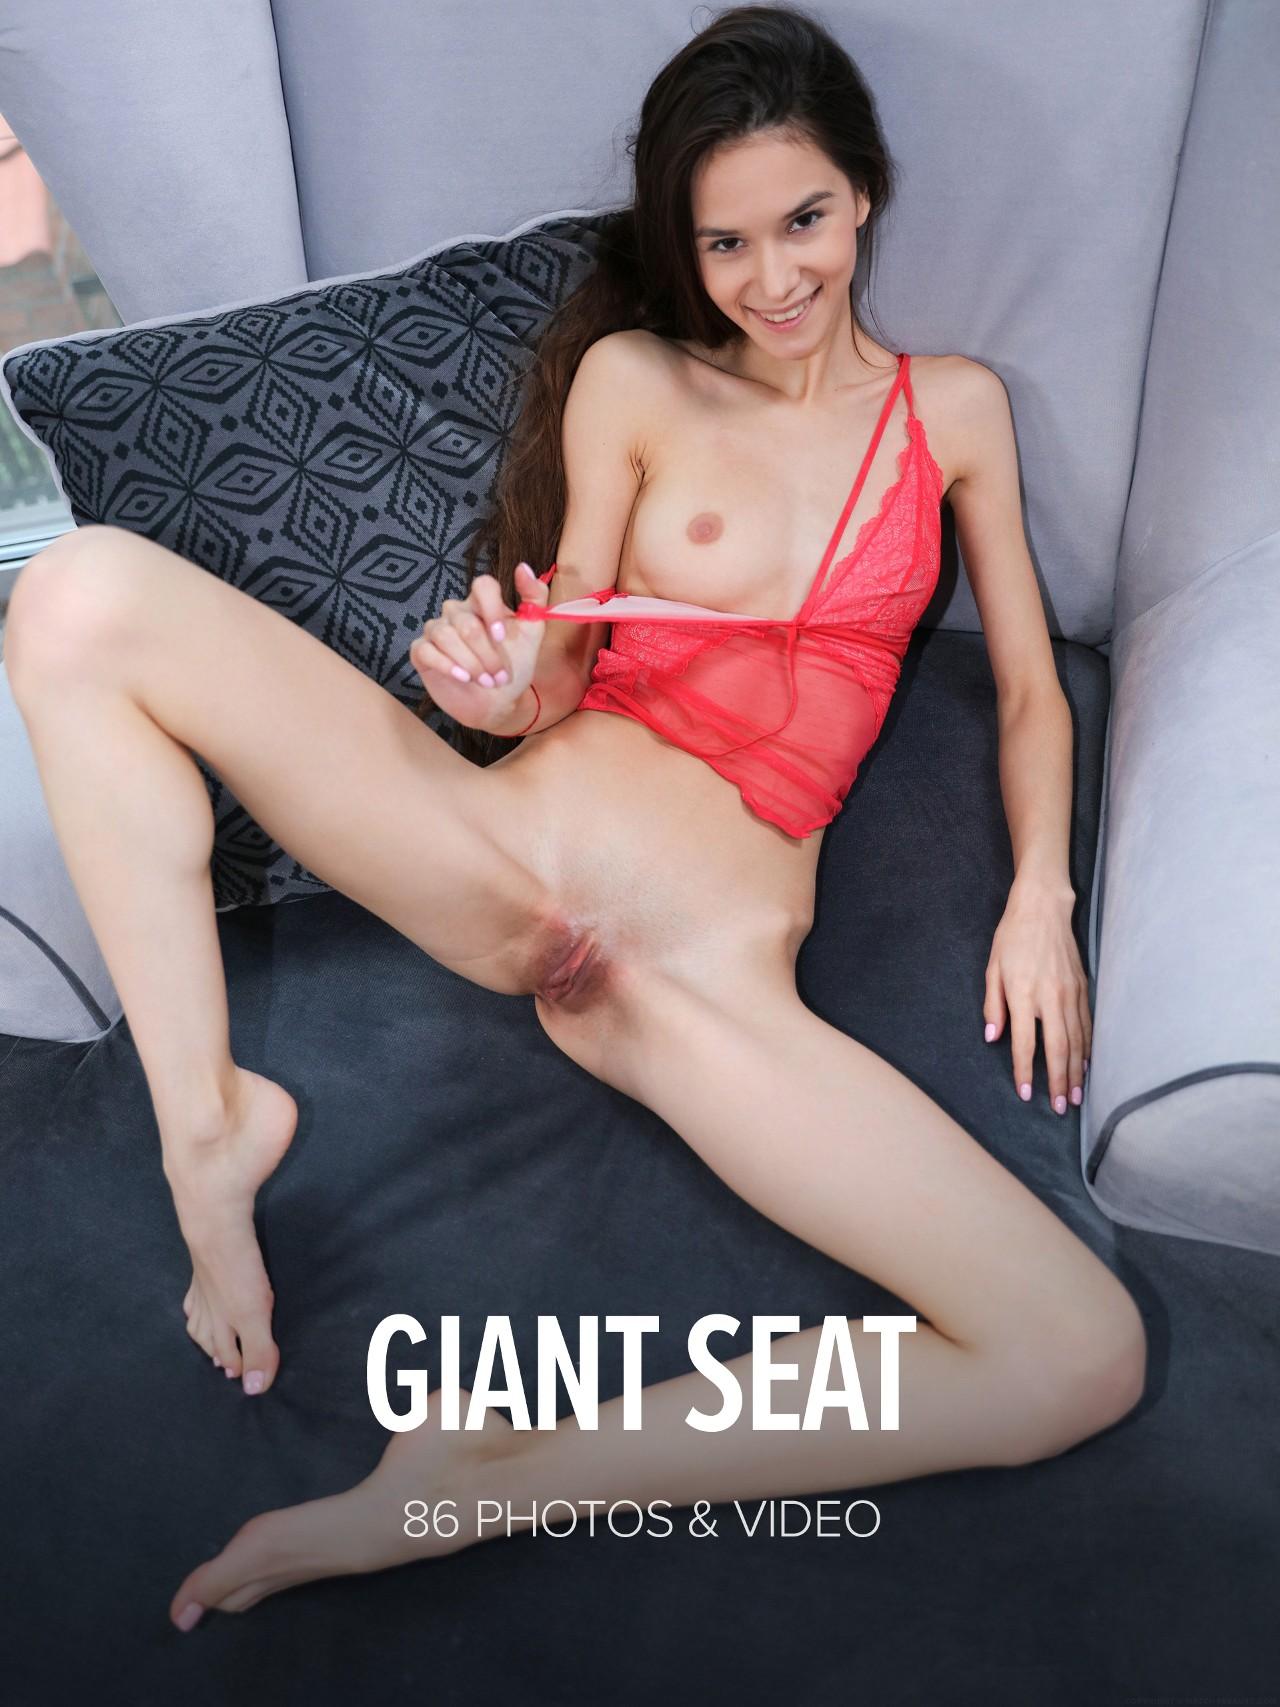 Leona Mia: Giant Seat